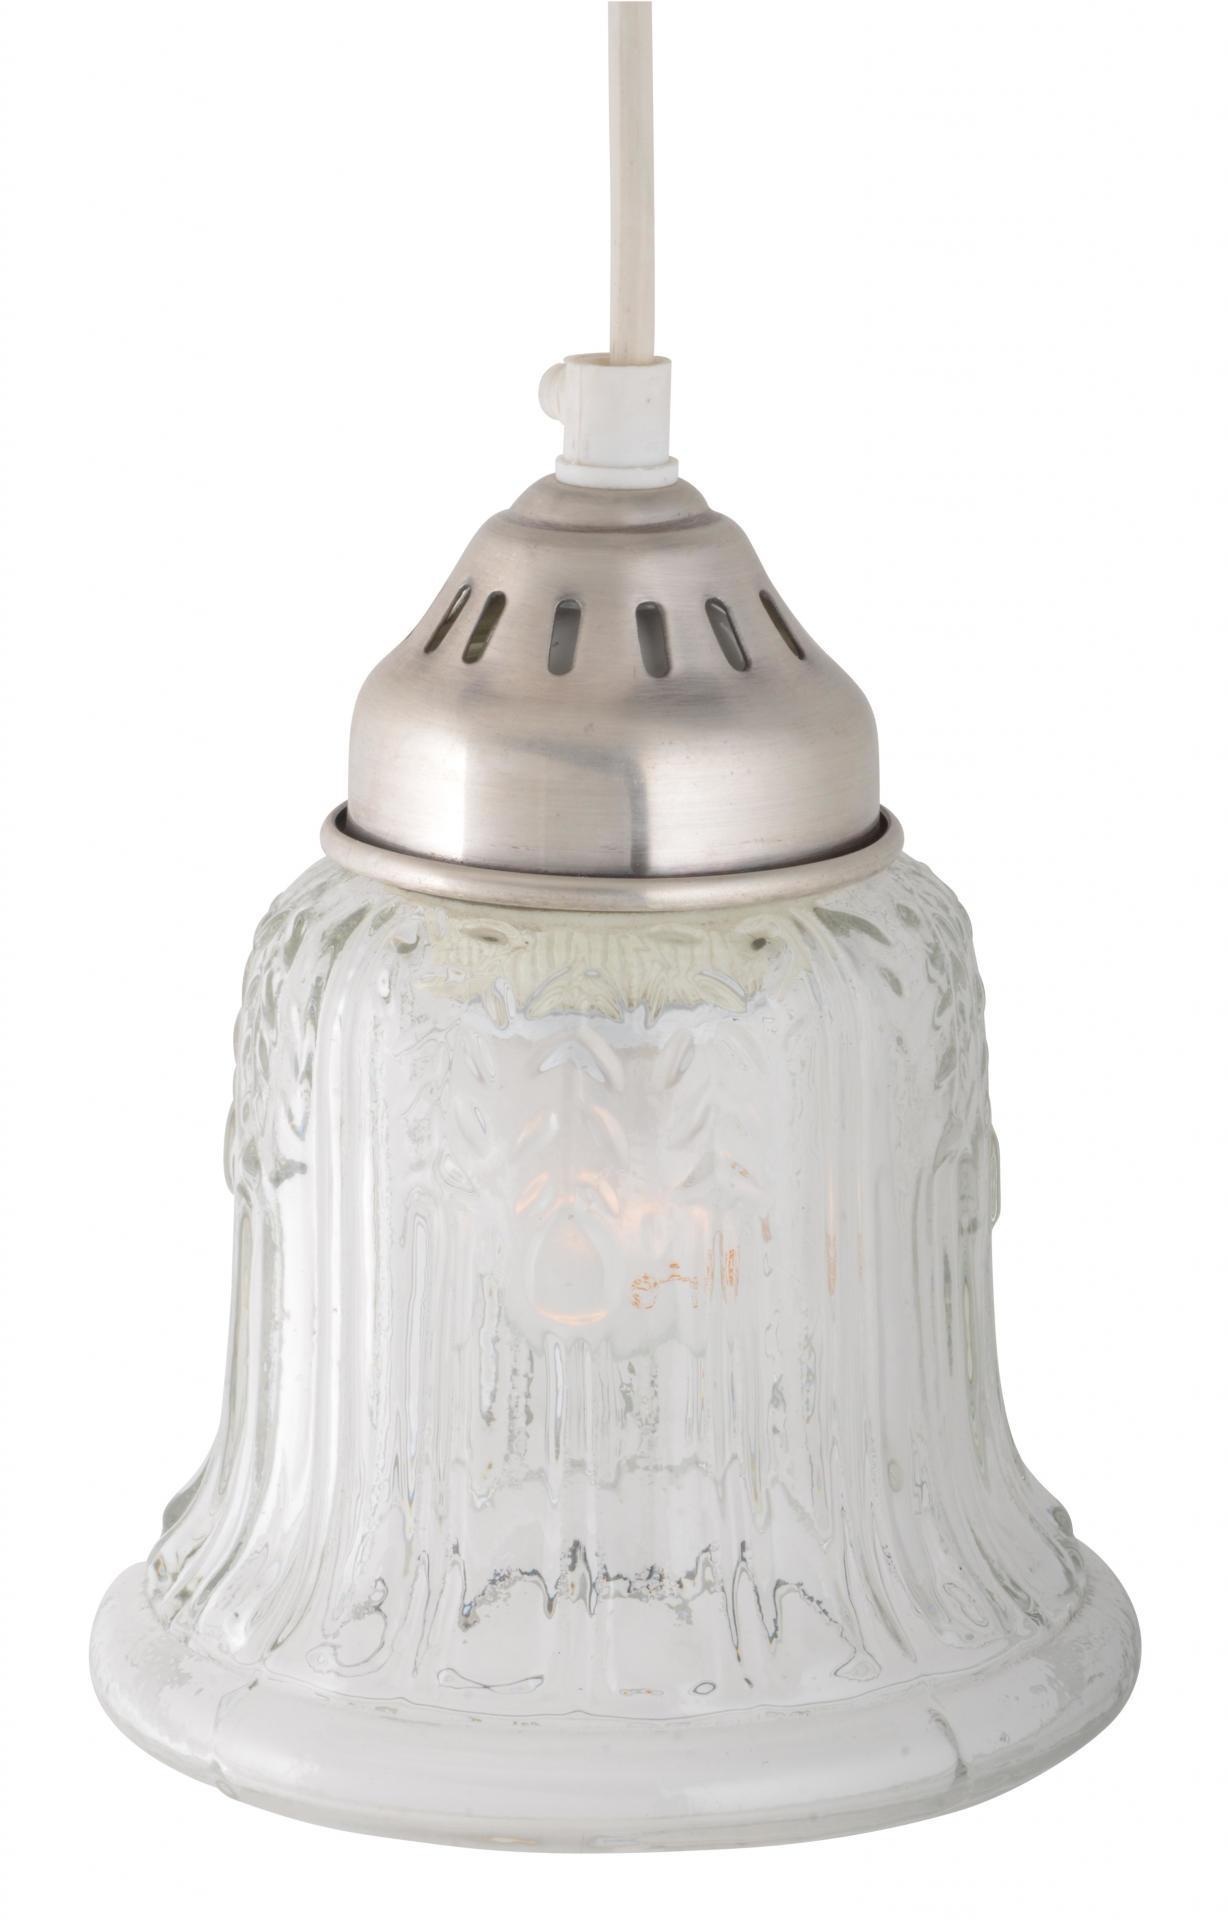 IB LAURSEN Stropní lampa Pressed glass, čirá barva, sklo, kov